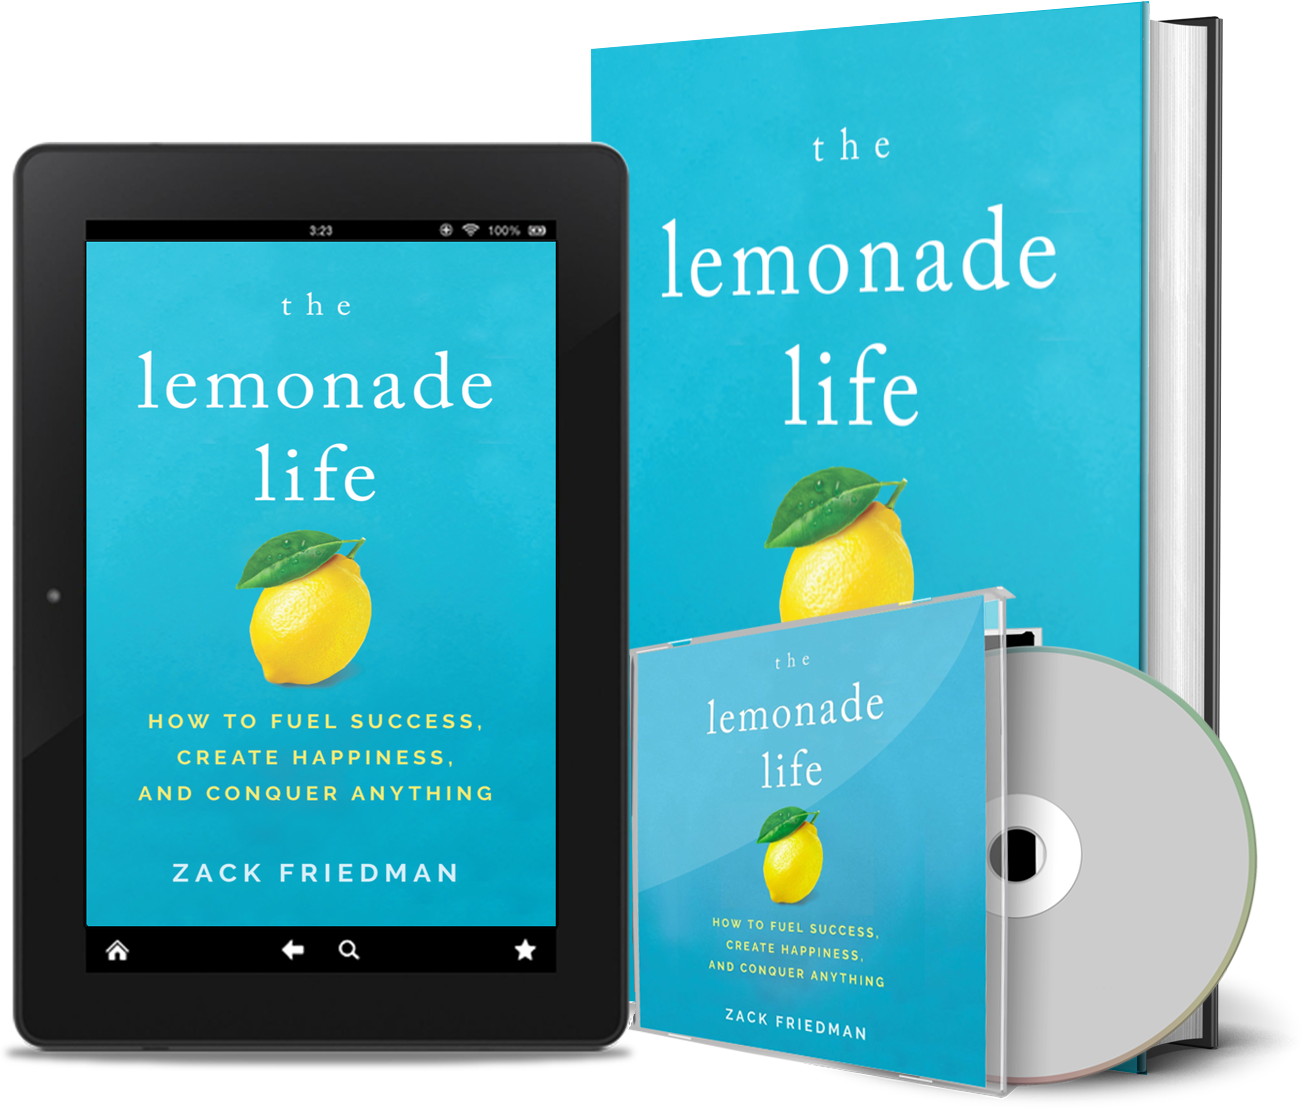 lemonade-life-formats-2